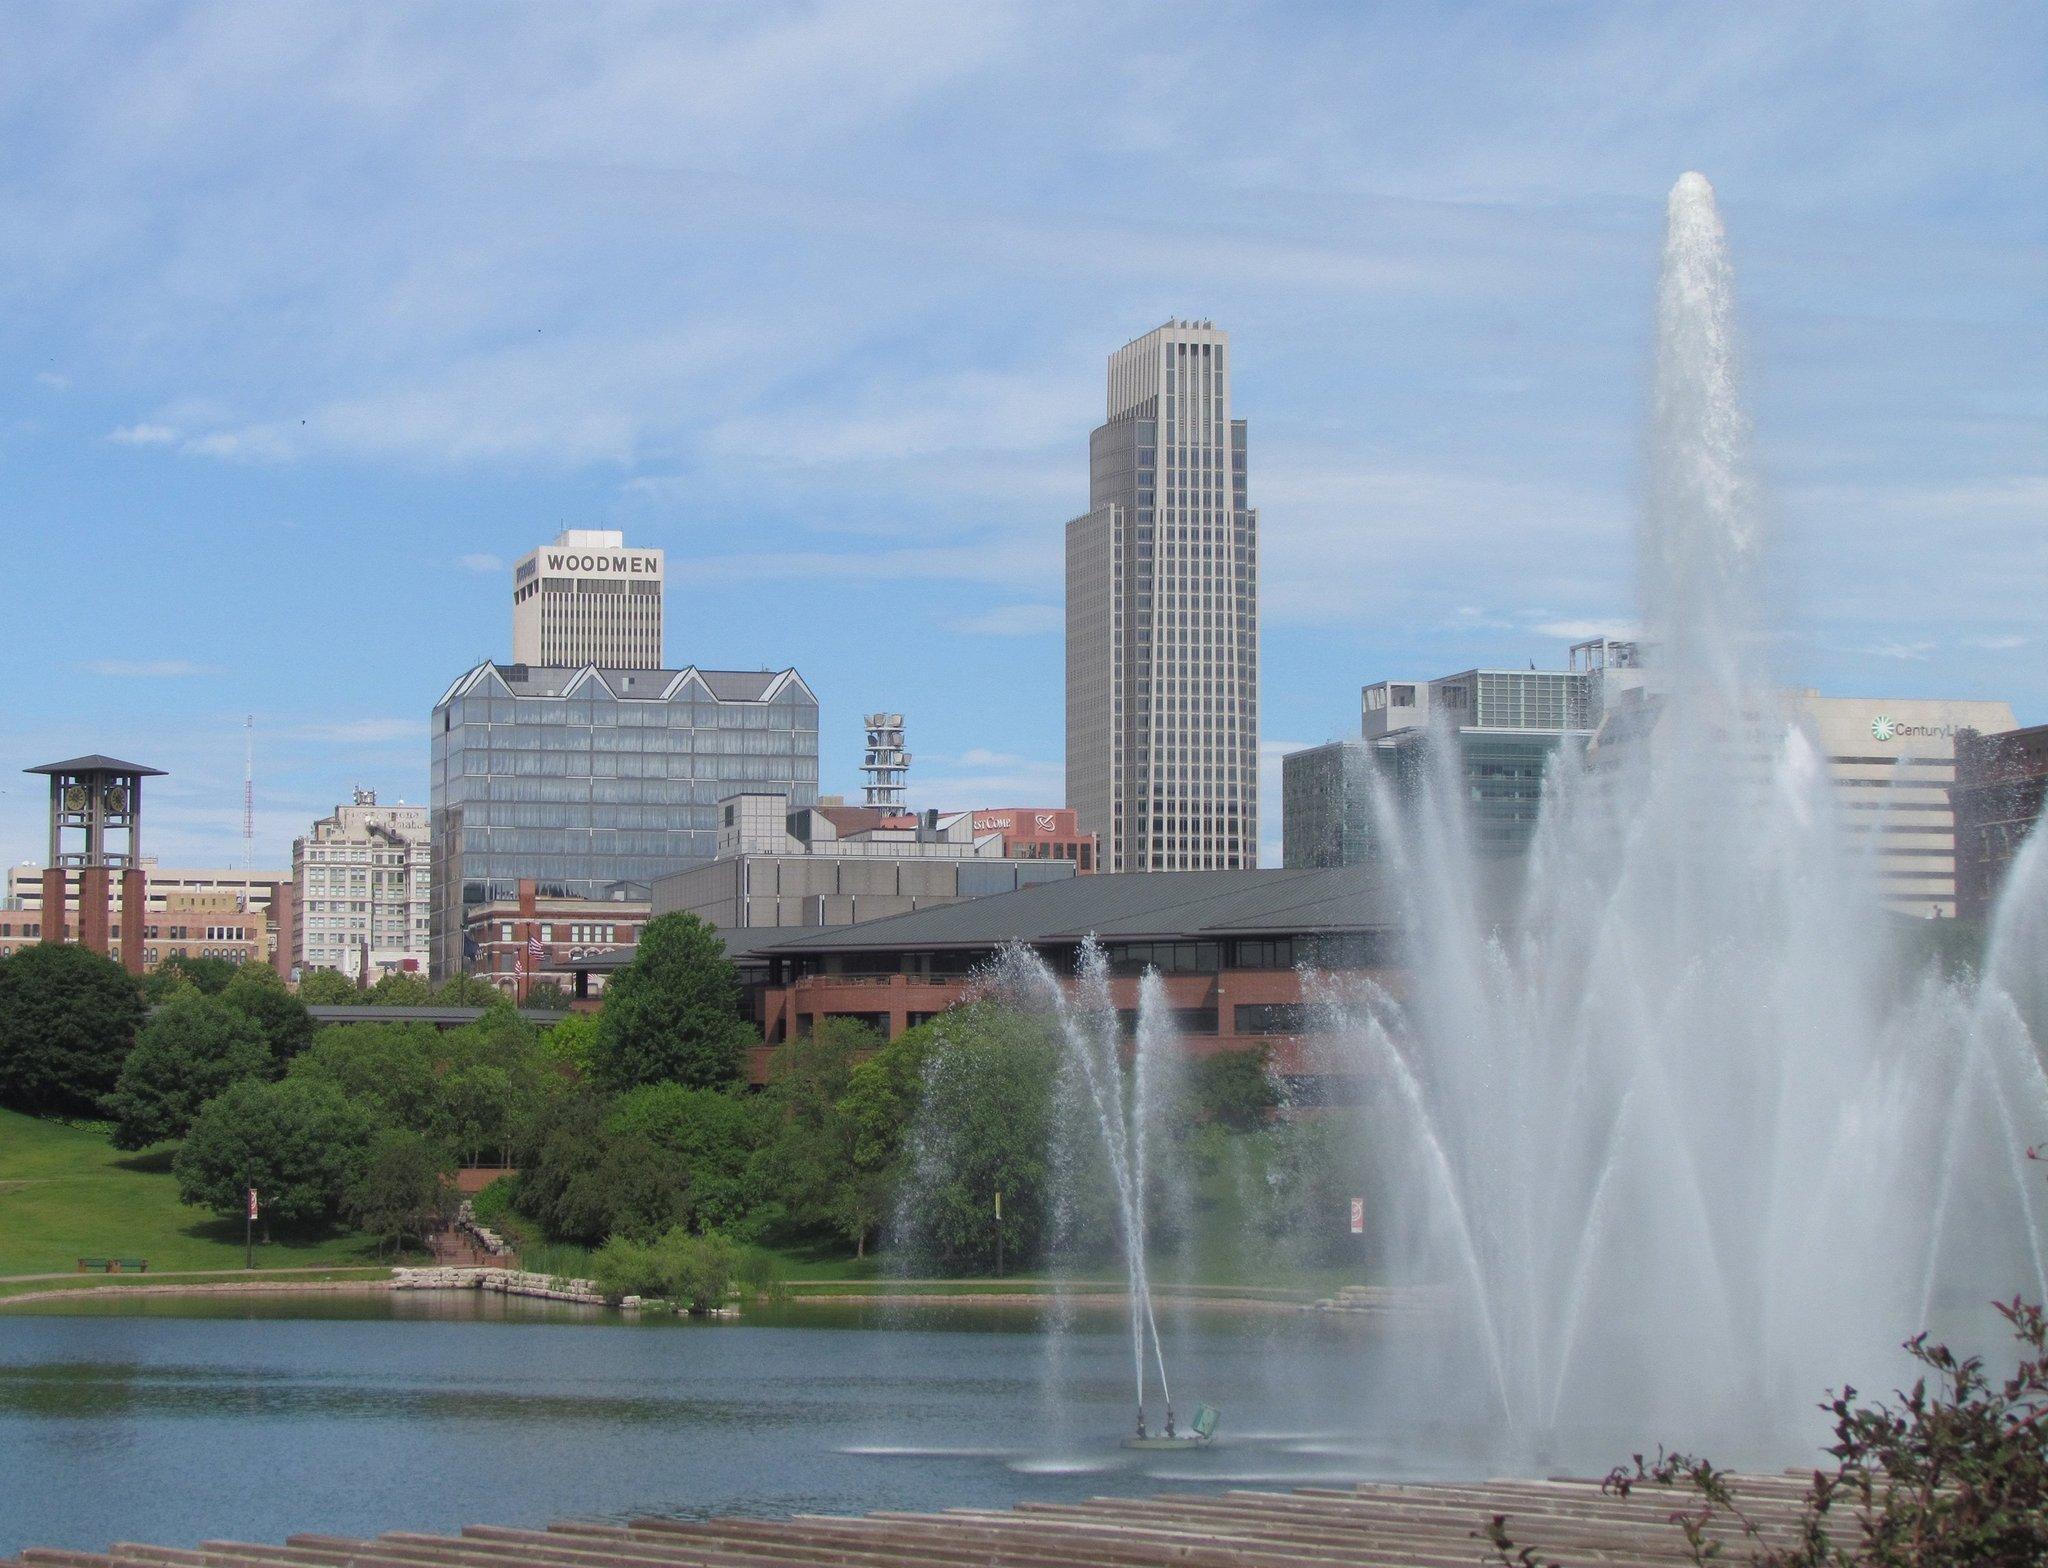 Omaha breathes new life into old neighborhoods - Chicago Tribune